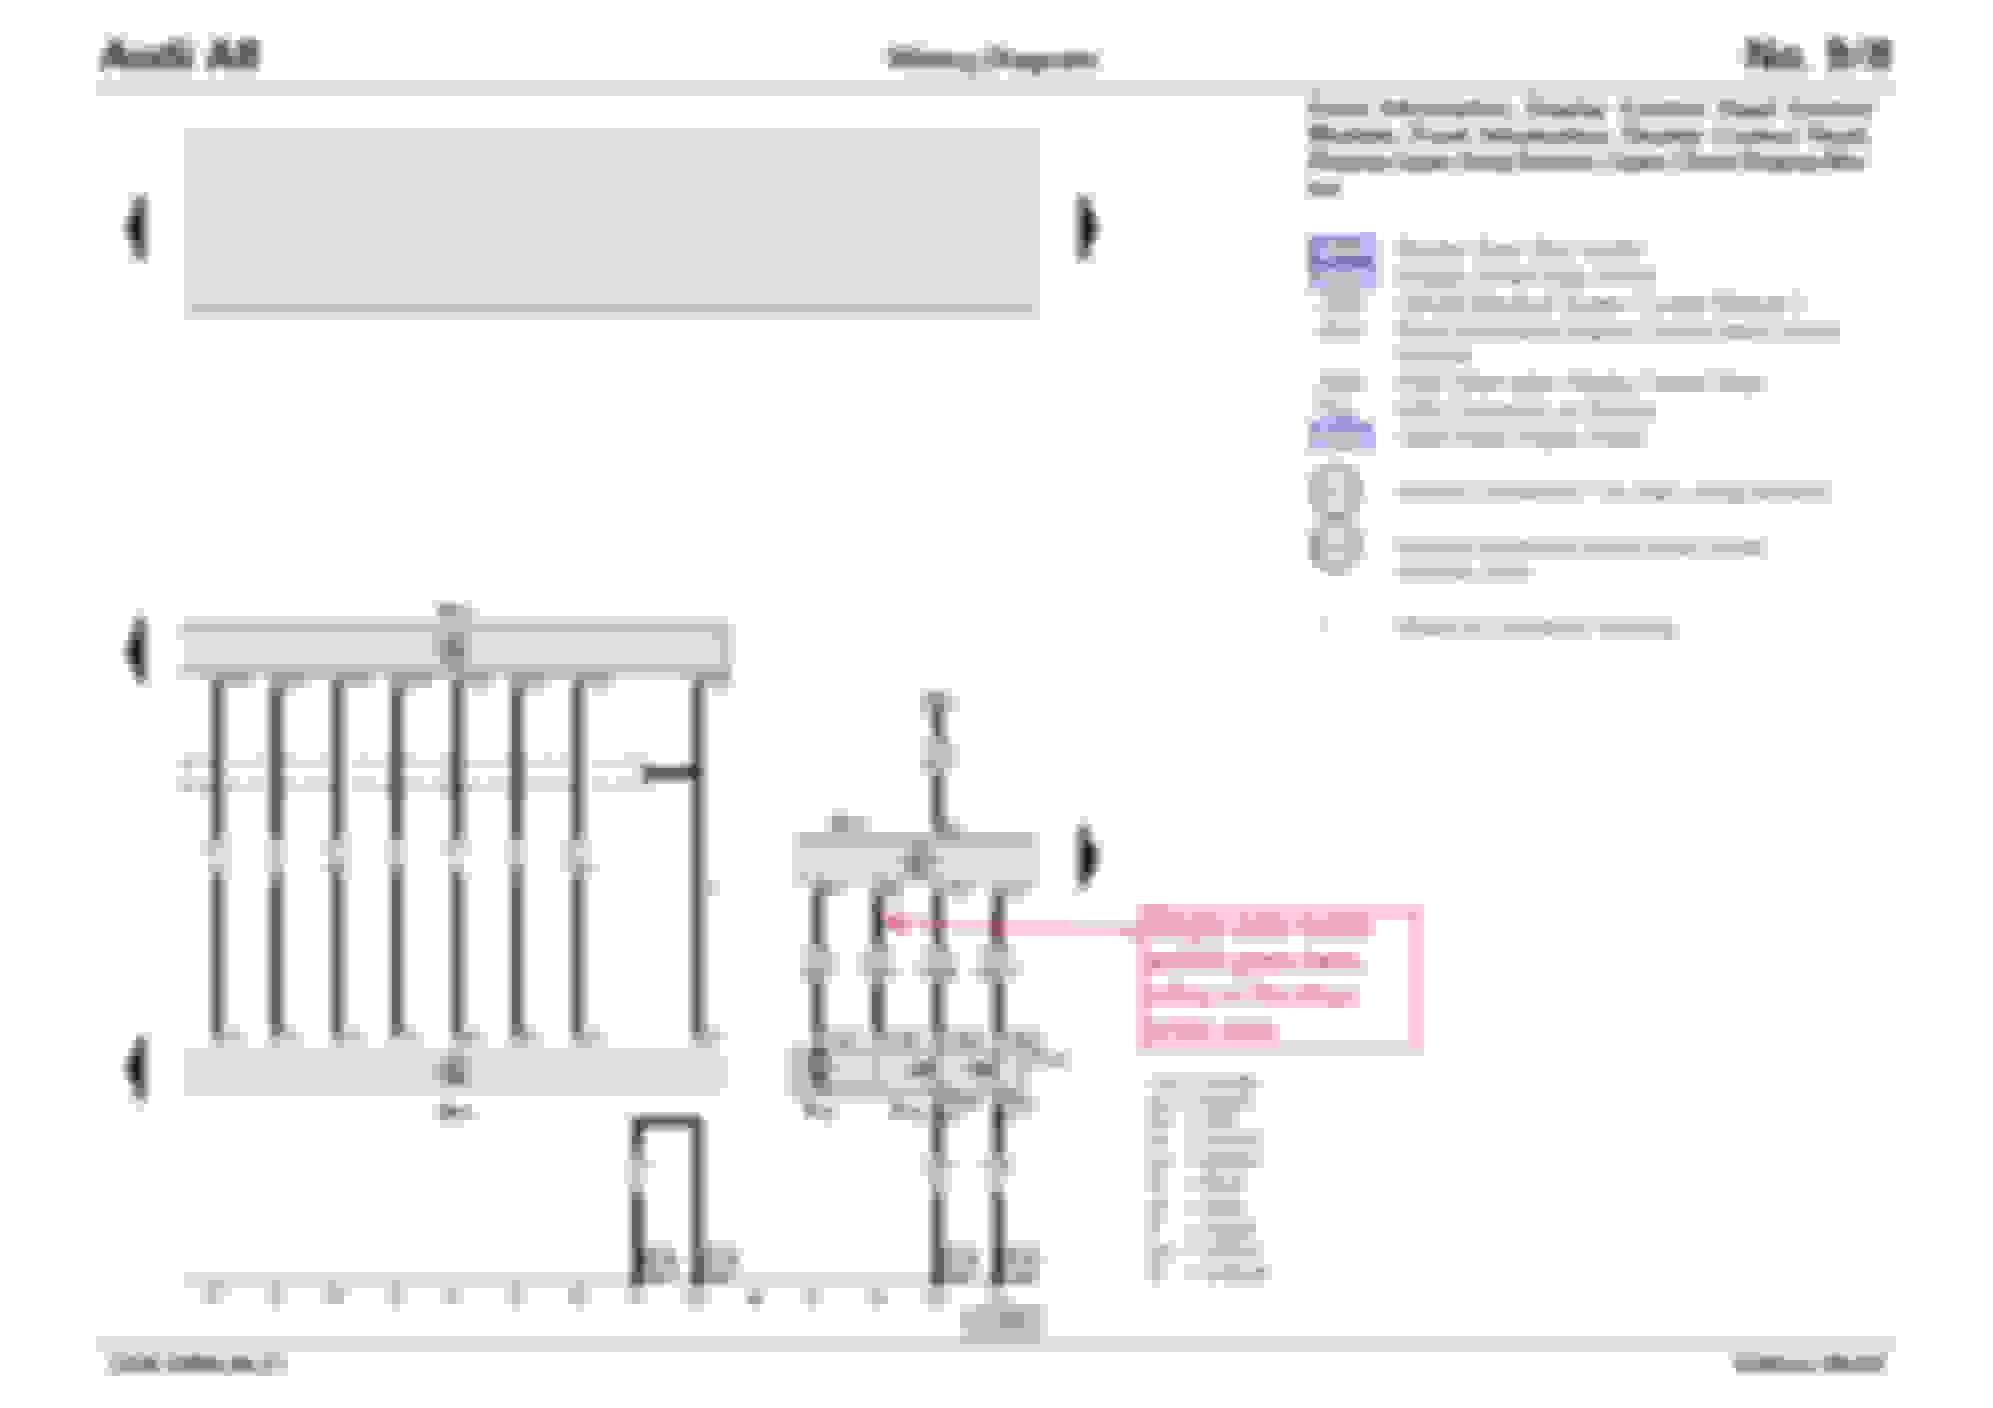 hight resolution of audi mmi wiring diagram wiring diagram schemes triumph wiring diagrams audi navigation wiring diagram